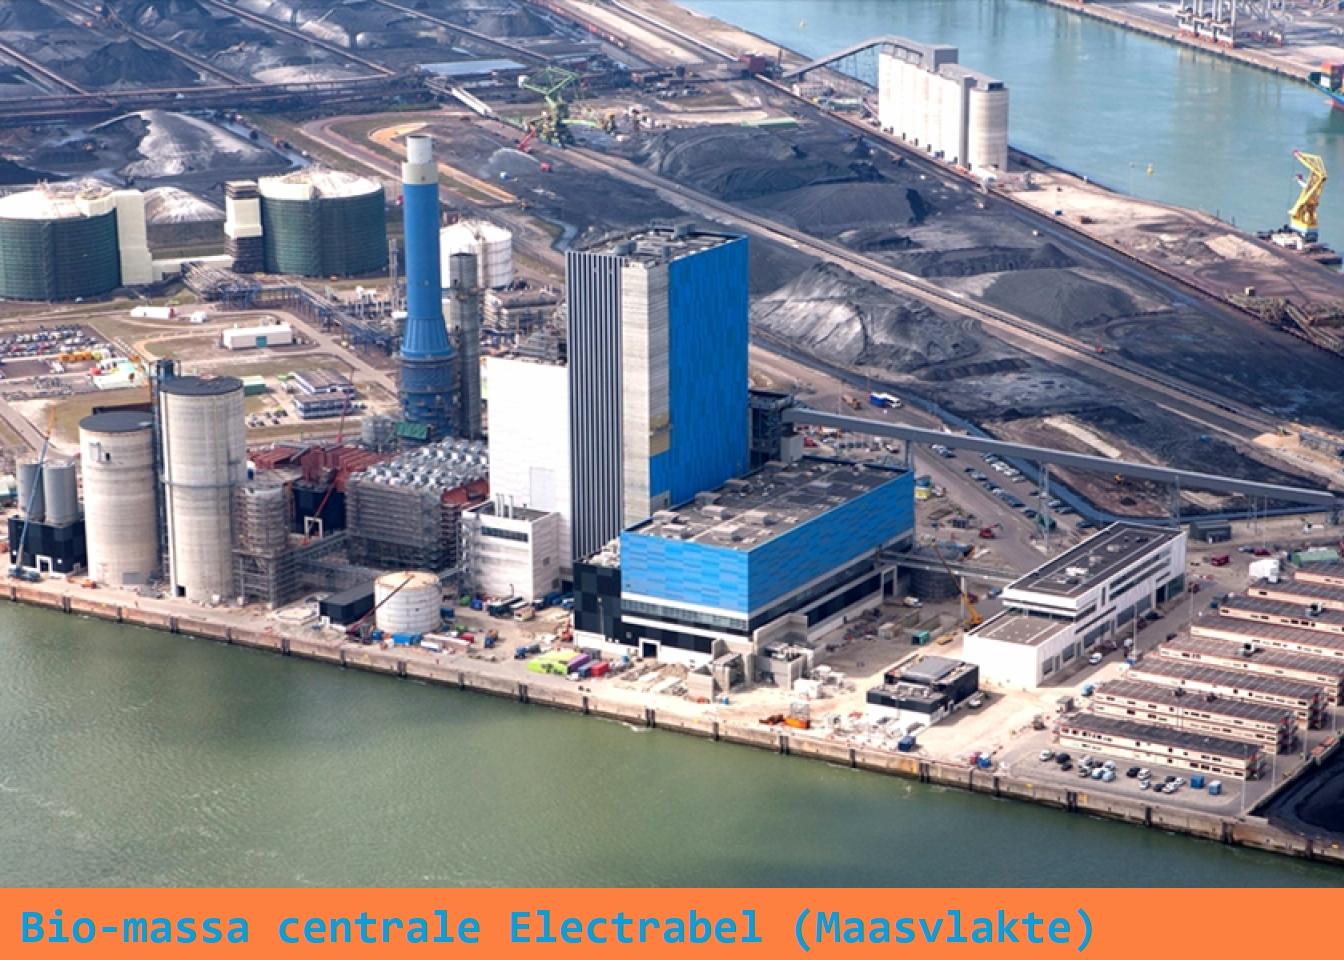 Biomassa centrale Electrabel - Maasvlakte